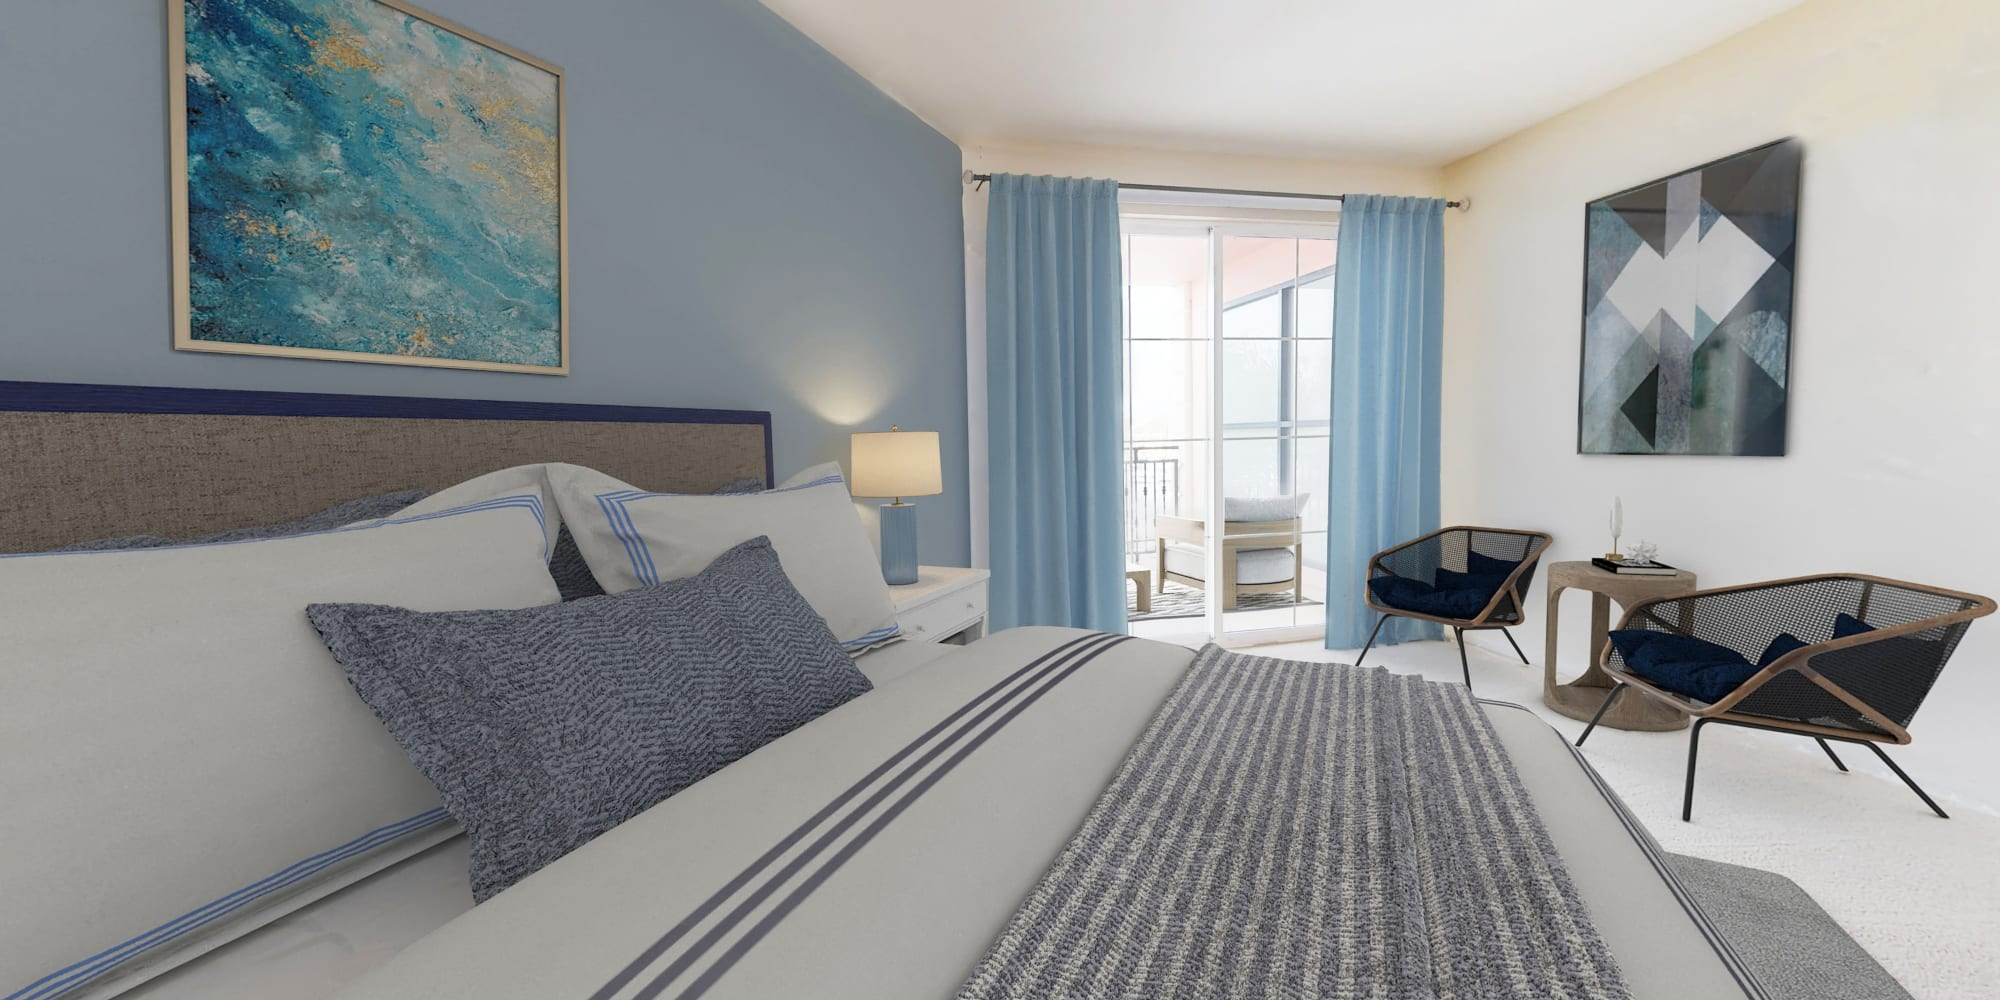 Extra large bedroom with sitting area and balcony overlooking the waterfront marina at The Villa at Marina Harbor in Marina del Rey, California